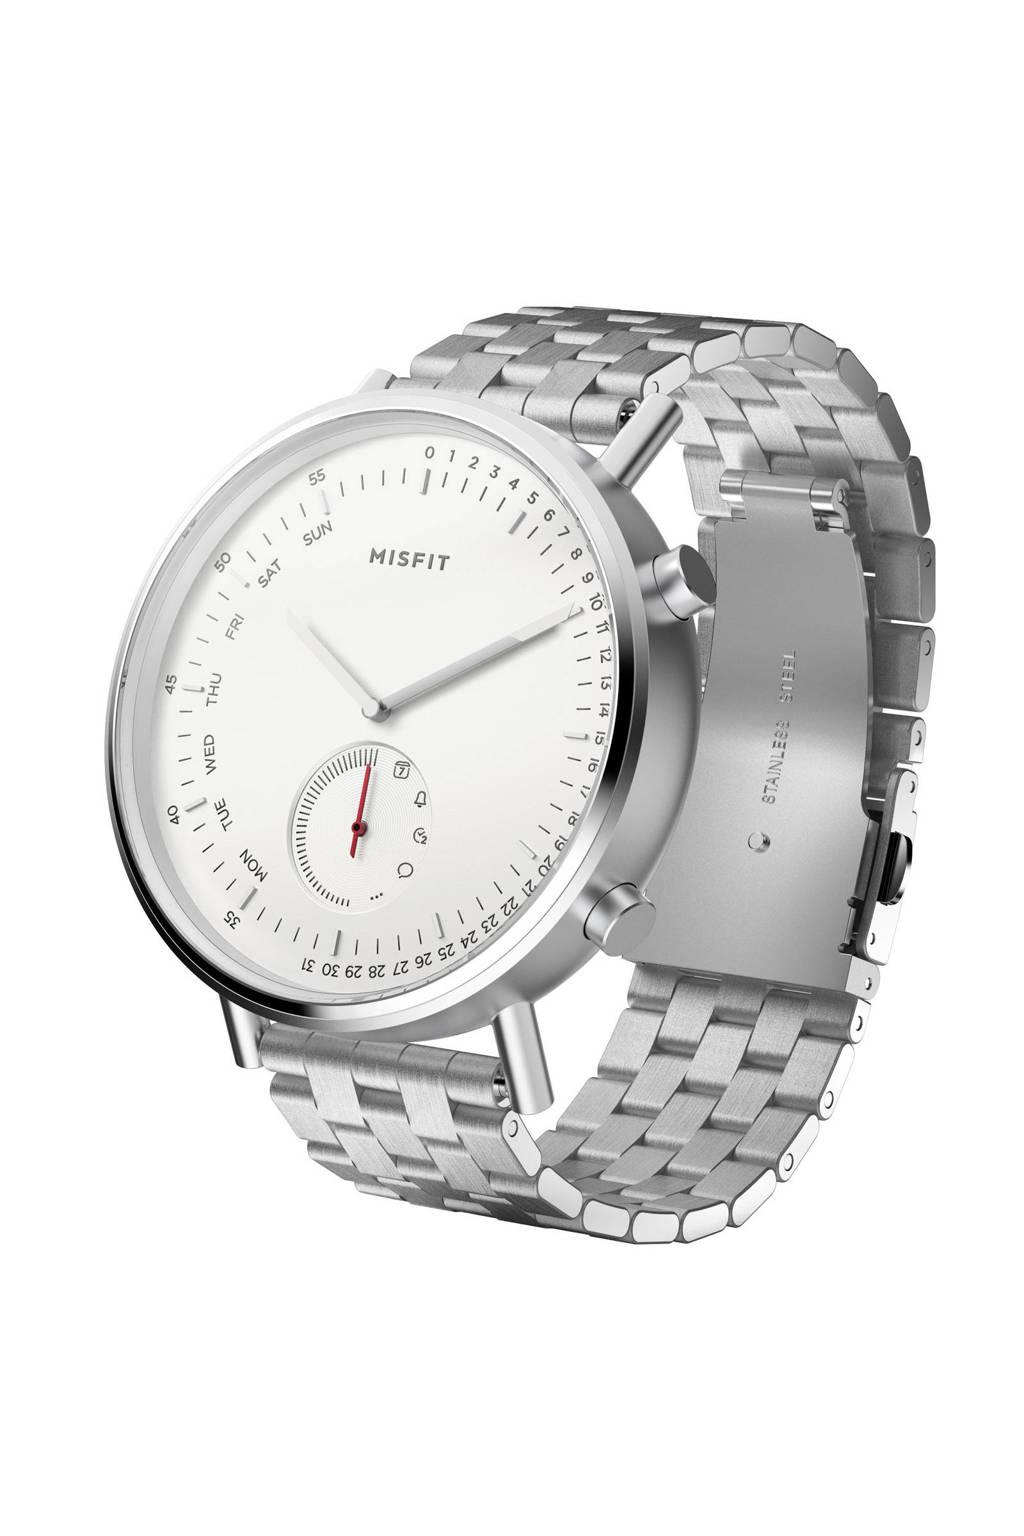 Misfit hybrid smartwatch Mammoth MIS5018, Ziver